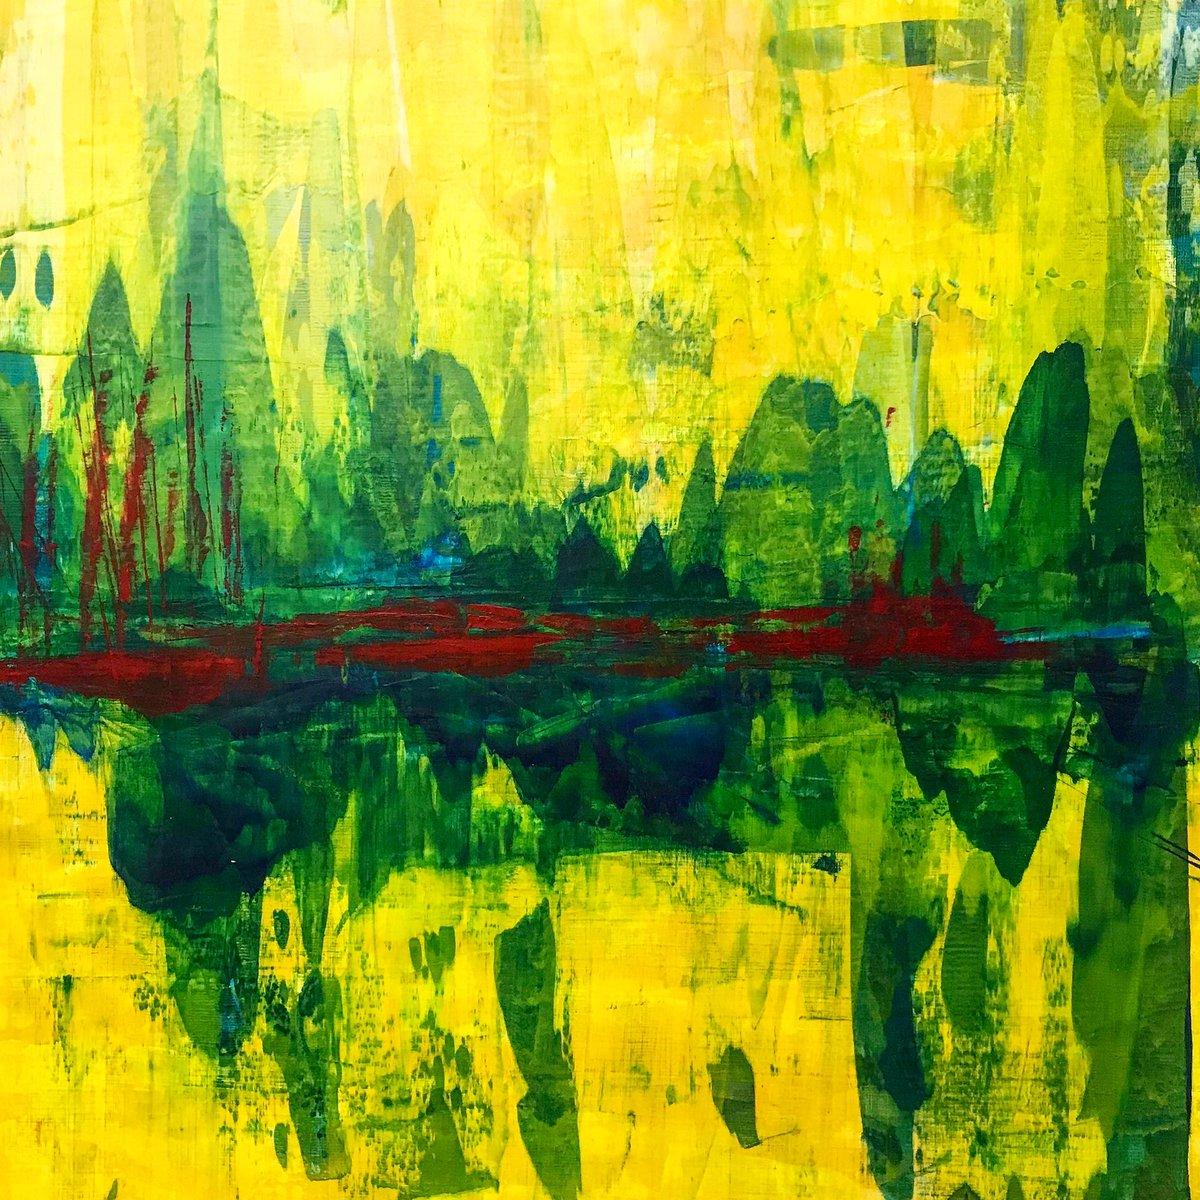 Reflections of realities, 2018 by Vilma Machado #linz #art  #artist #artwork #contemporaryart #curator #reflections #kunst #kunstwerk #künstler #gallery #museum #artmuseum #reality #vilmamachado #vilmamachadoartpic.twitter.com/MD3IdwQdKq